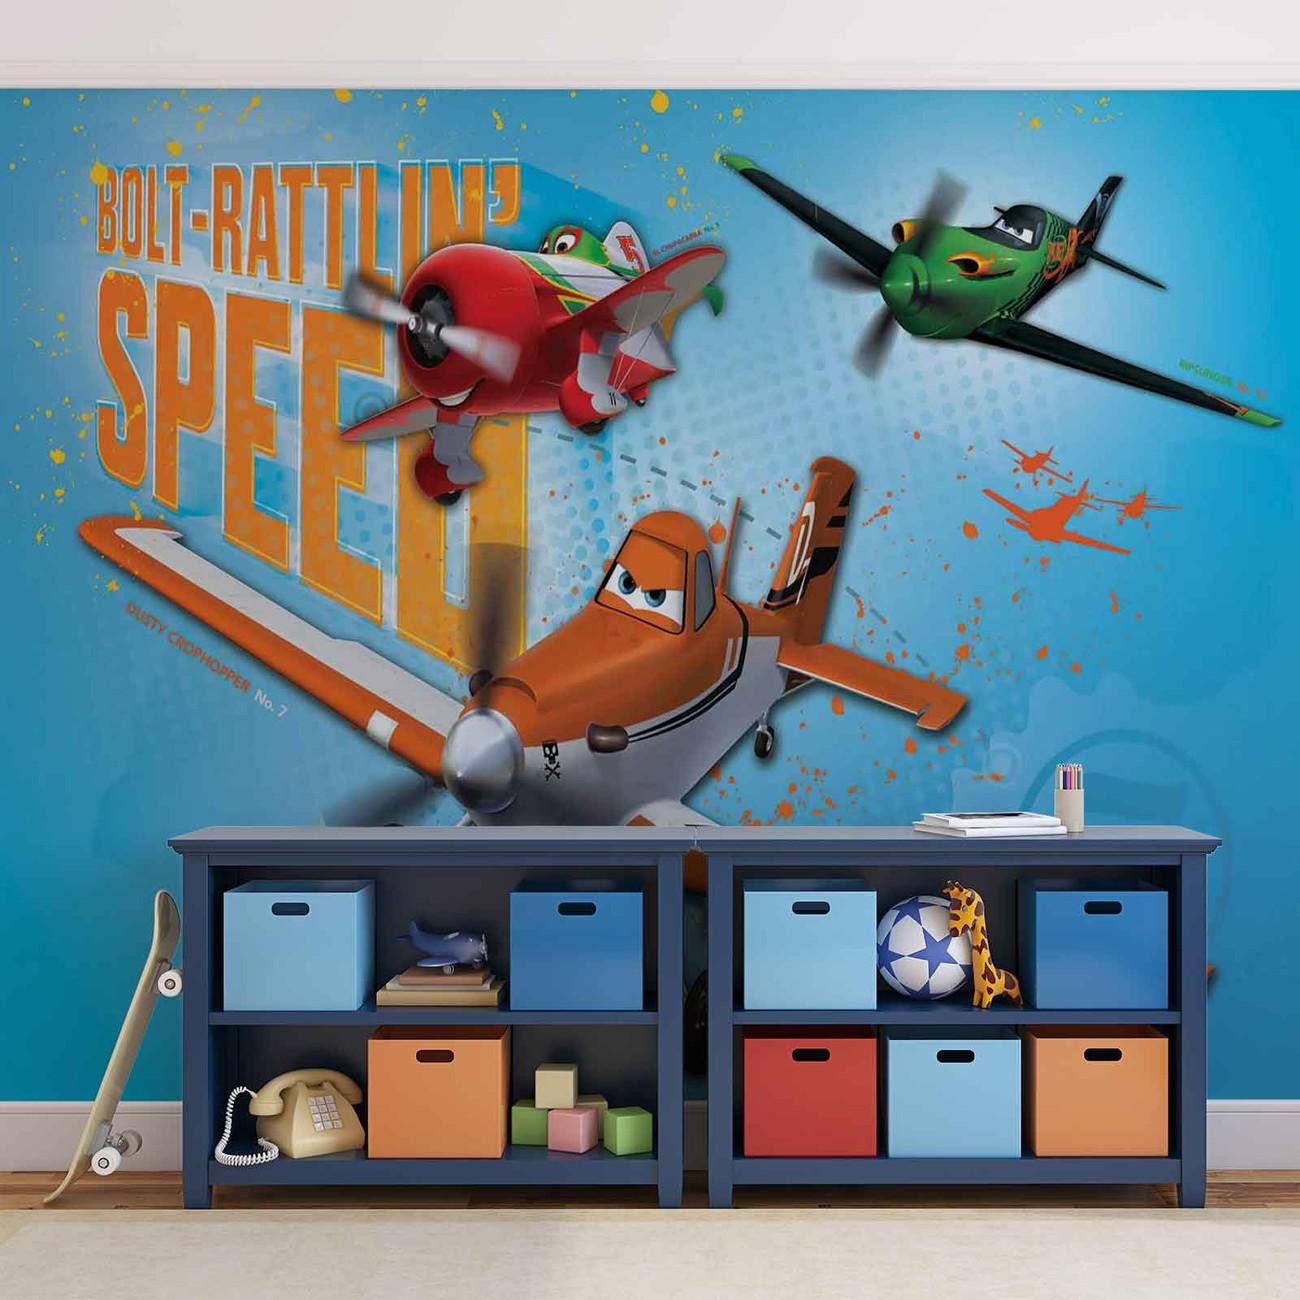 Disney planes wall paper mural buy at europosters for Disney planes wall mural